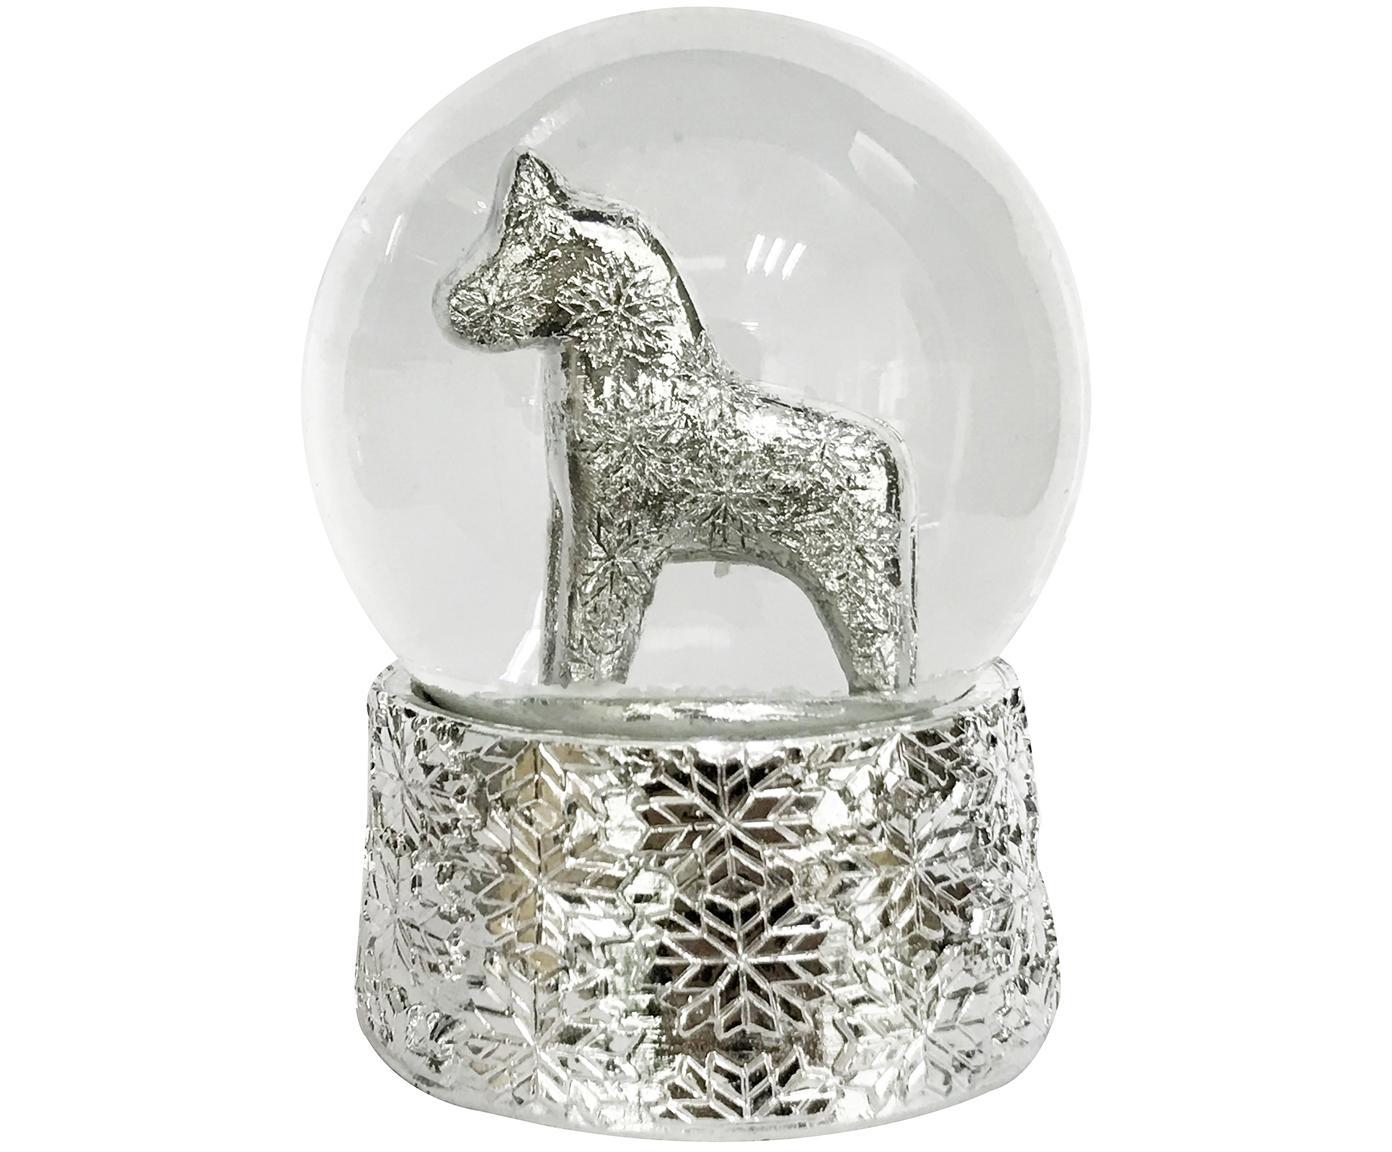 Sneeuwbol Serafina Horse, Stolp: glas, Voetstuk: polyresin, Zilverkleurig, Ø 7 x H 8 cm